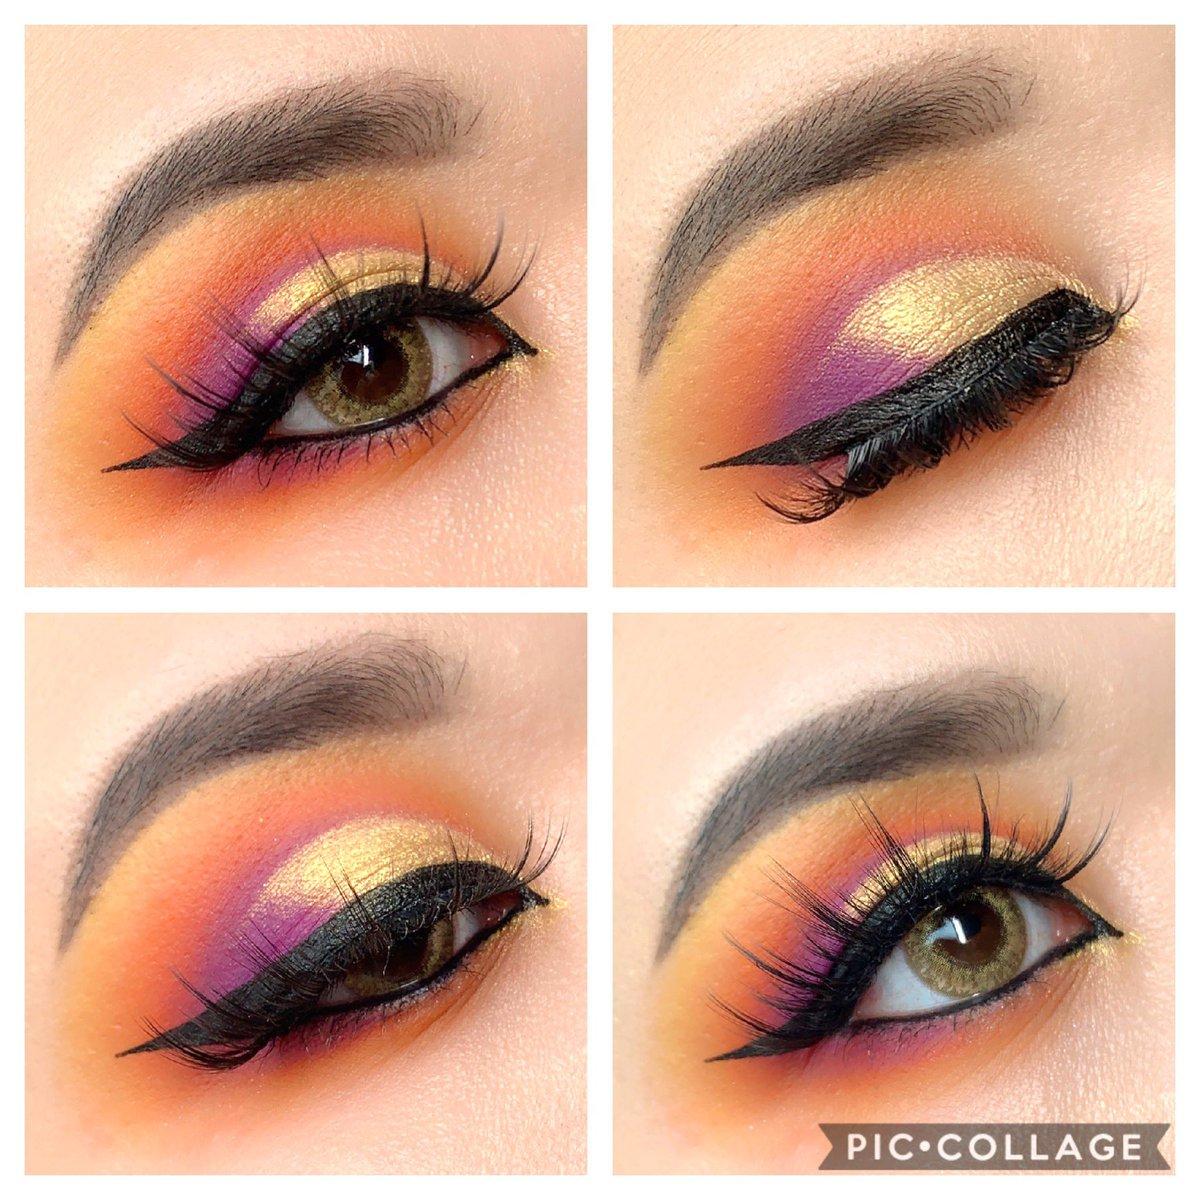 Sunset 🌅 makeup  ちょっと...やりたかったやつと違うから... リベンジする...  Eye Shadow @bperfectcosm CARNIVAL XL PRO   Colour contact @lilyanna_shop LILMOON CRAEMBEIGE  #make #メイク #ビーパフェクト #リリーアンナ公式アンバサダー #LILMOON #CREAMBEIGE #リルムーン #クリームベージュ